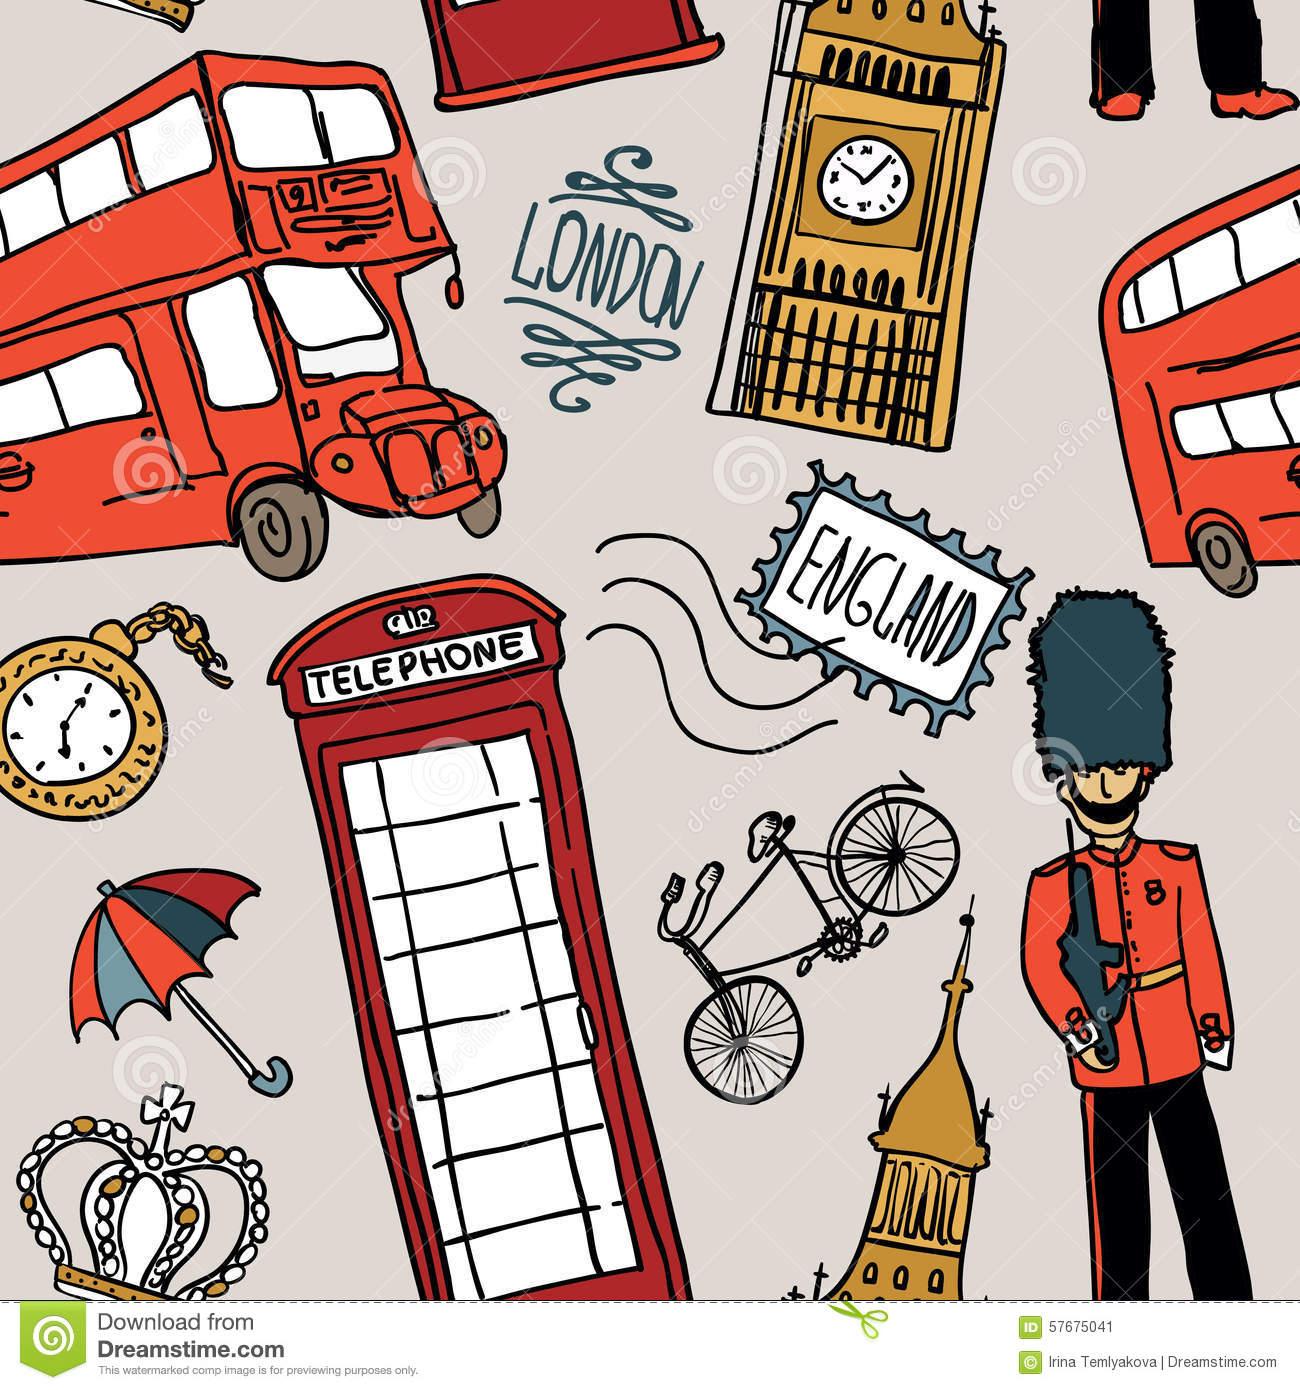 English Background Stock Vector. Illustration Of London à Page De Garde En Anglais